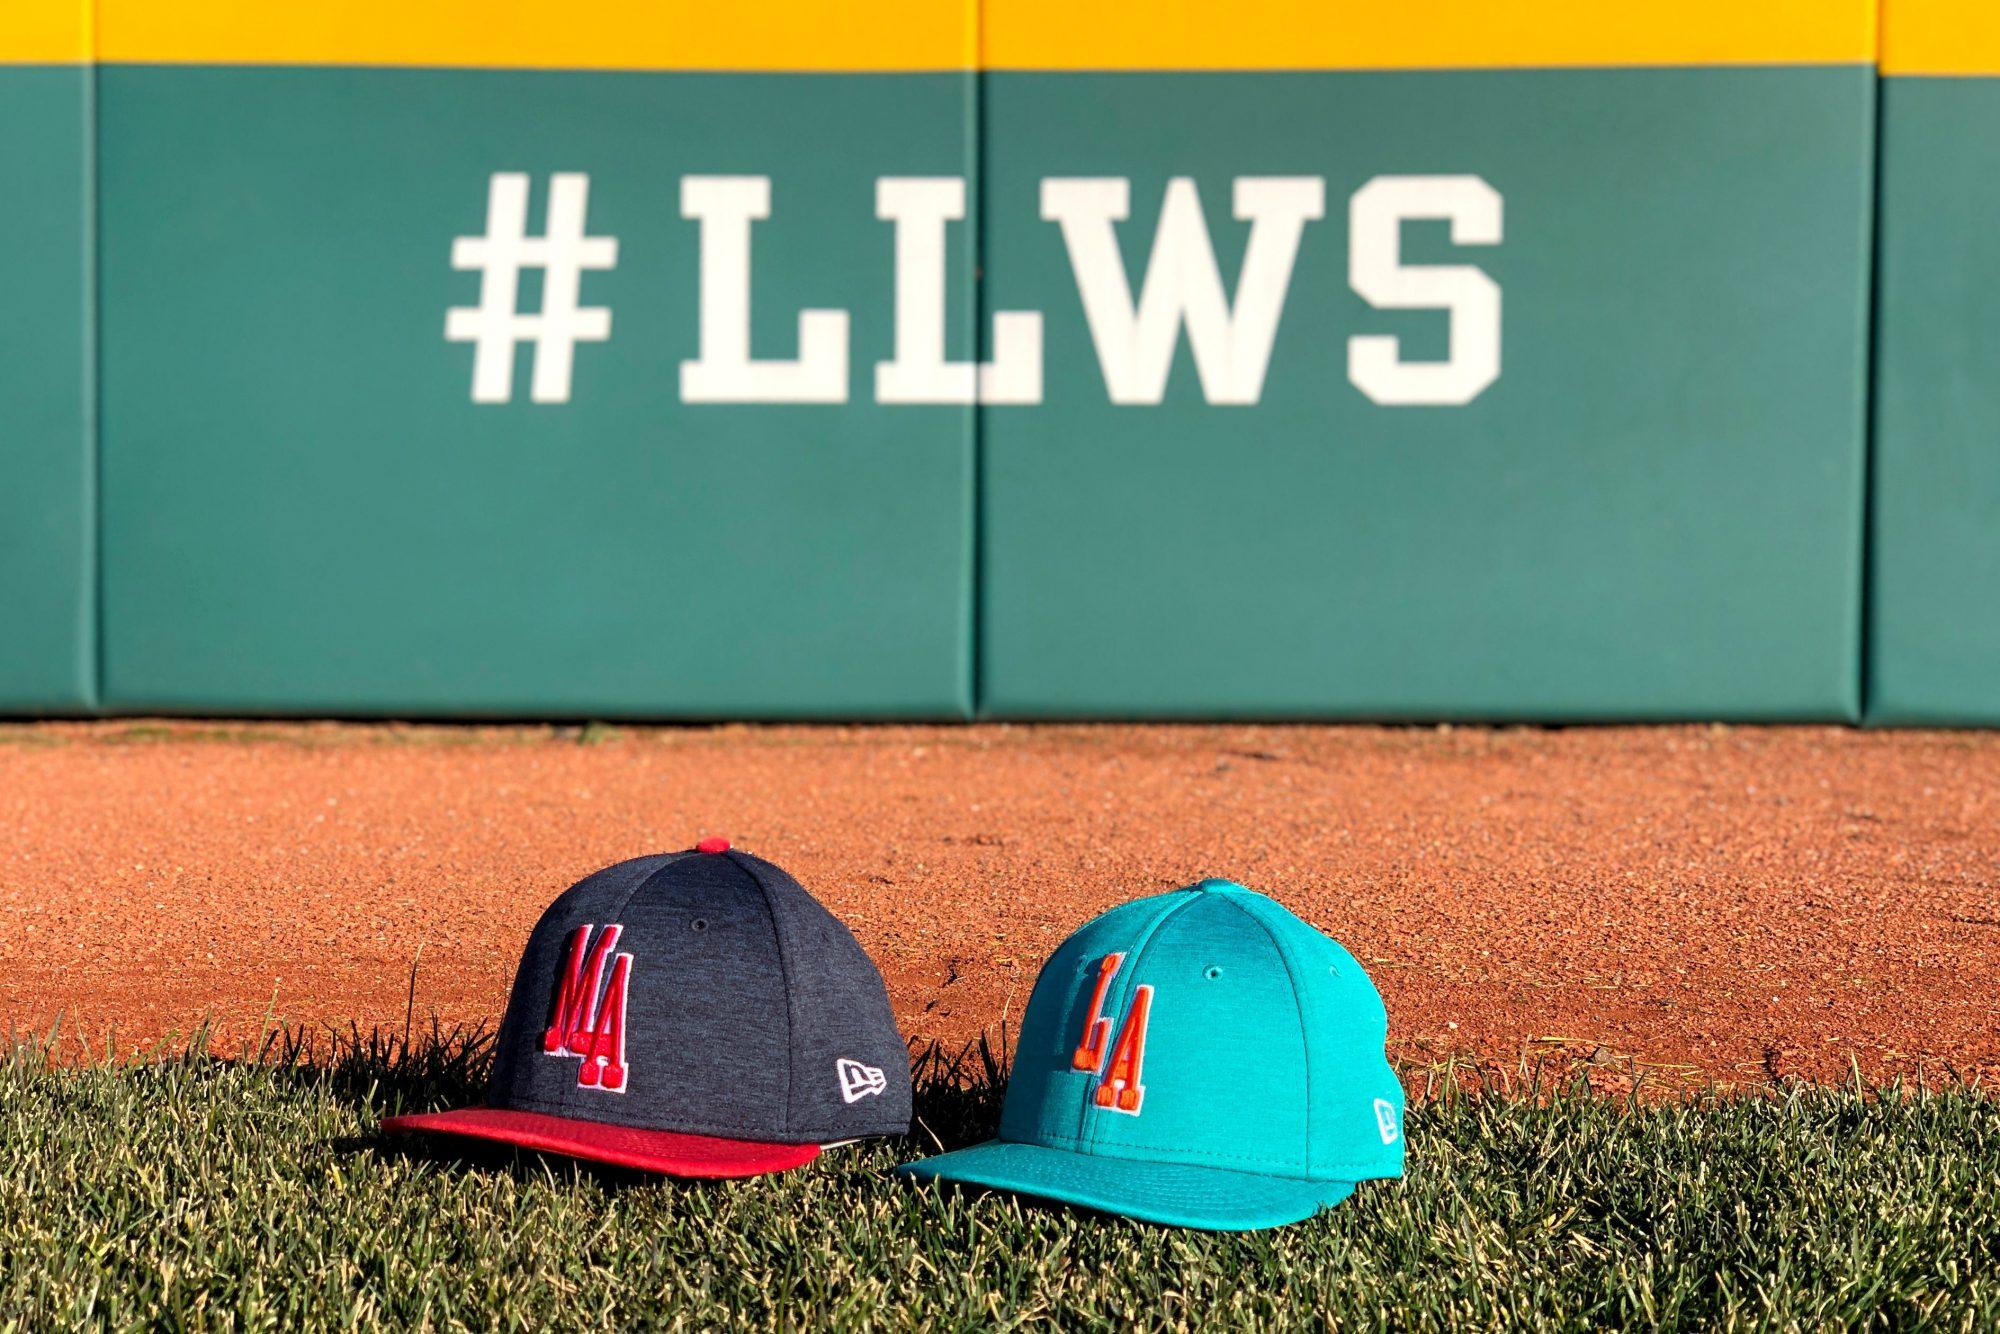 New Era Caps on LLWS Fields